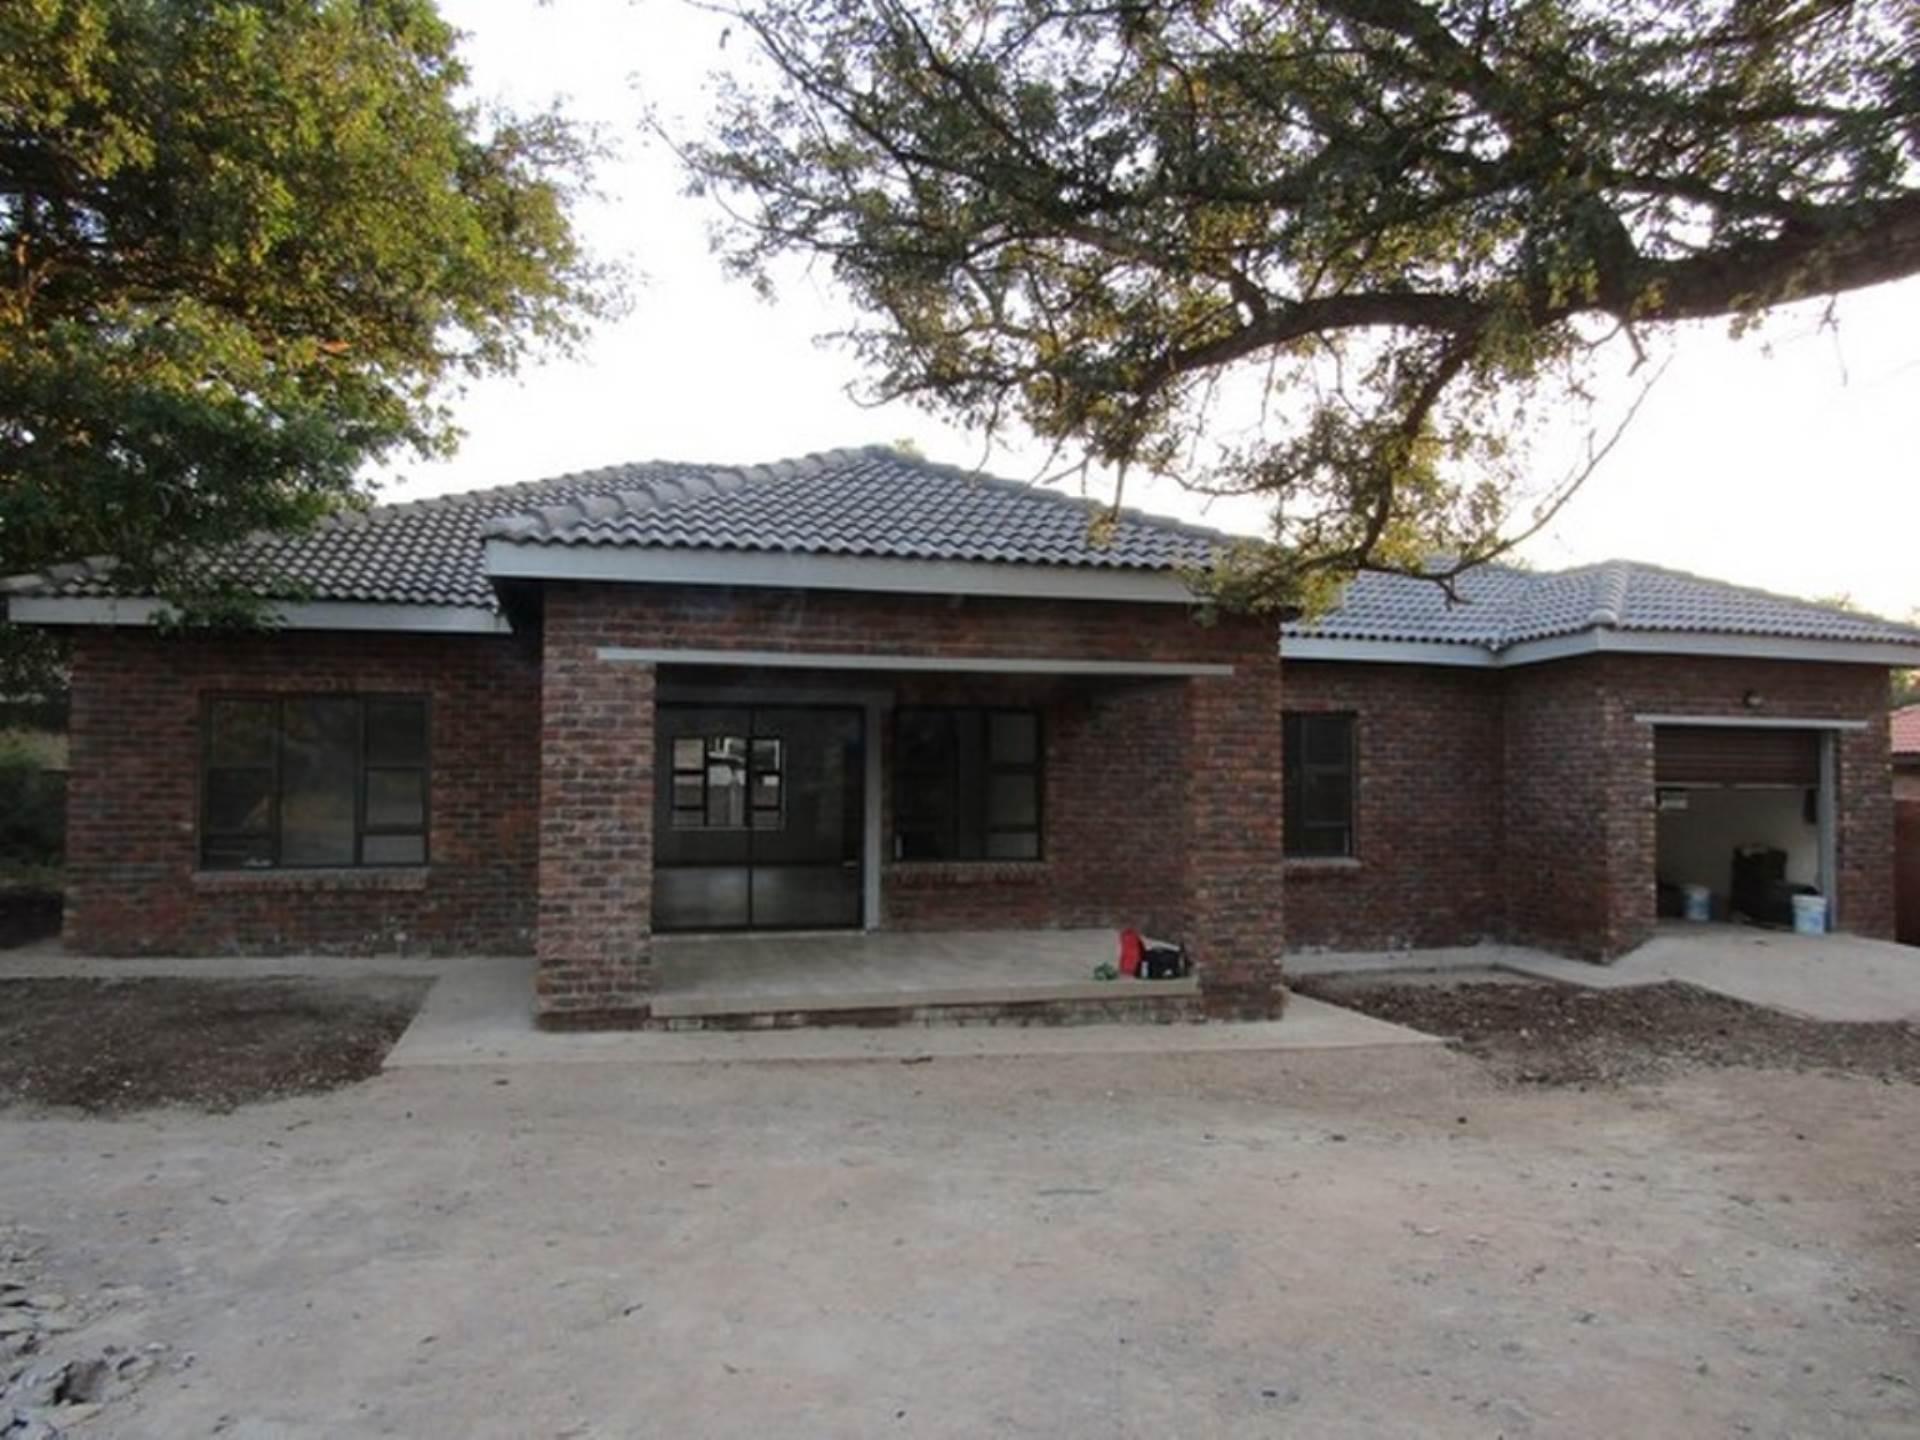 3 BedroomHouse For Sale In Komatipoort